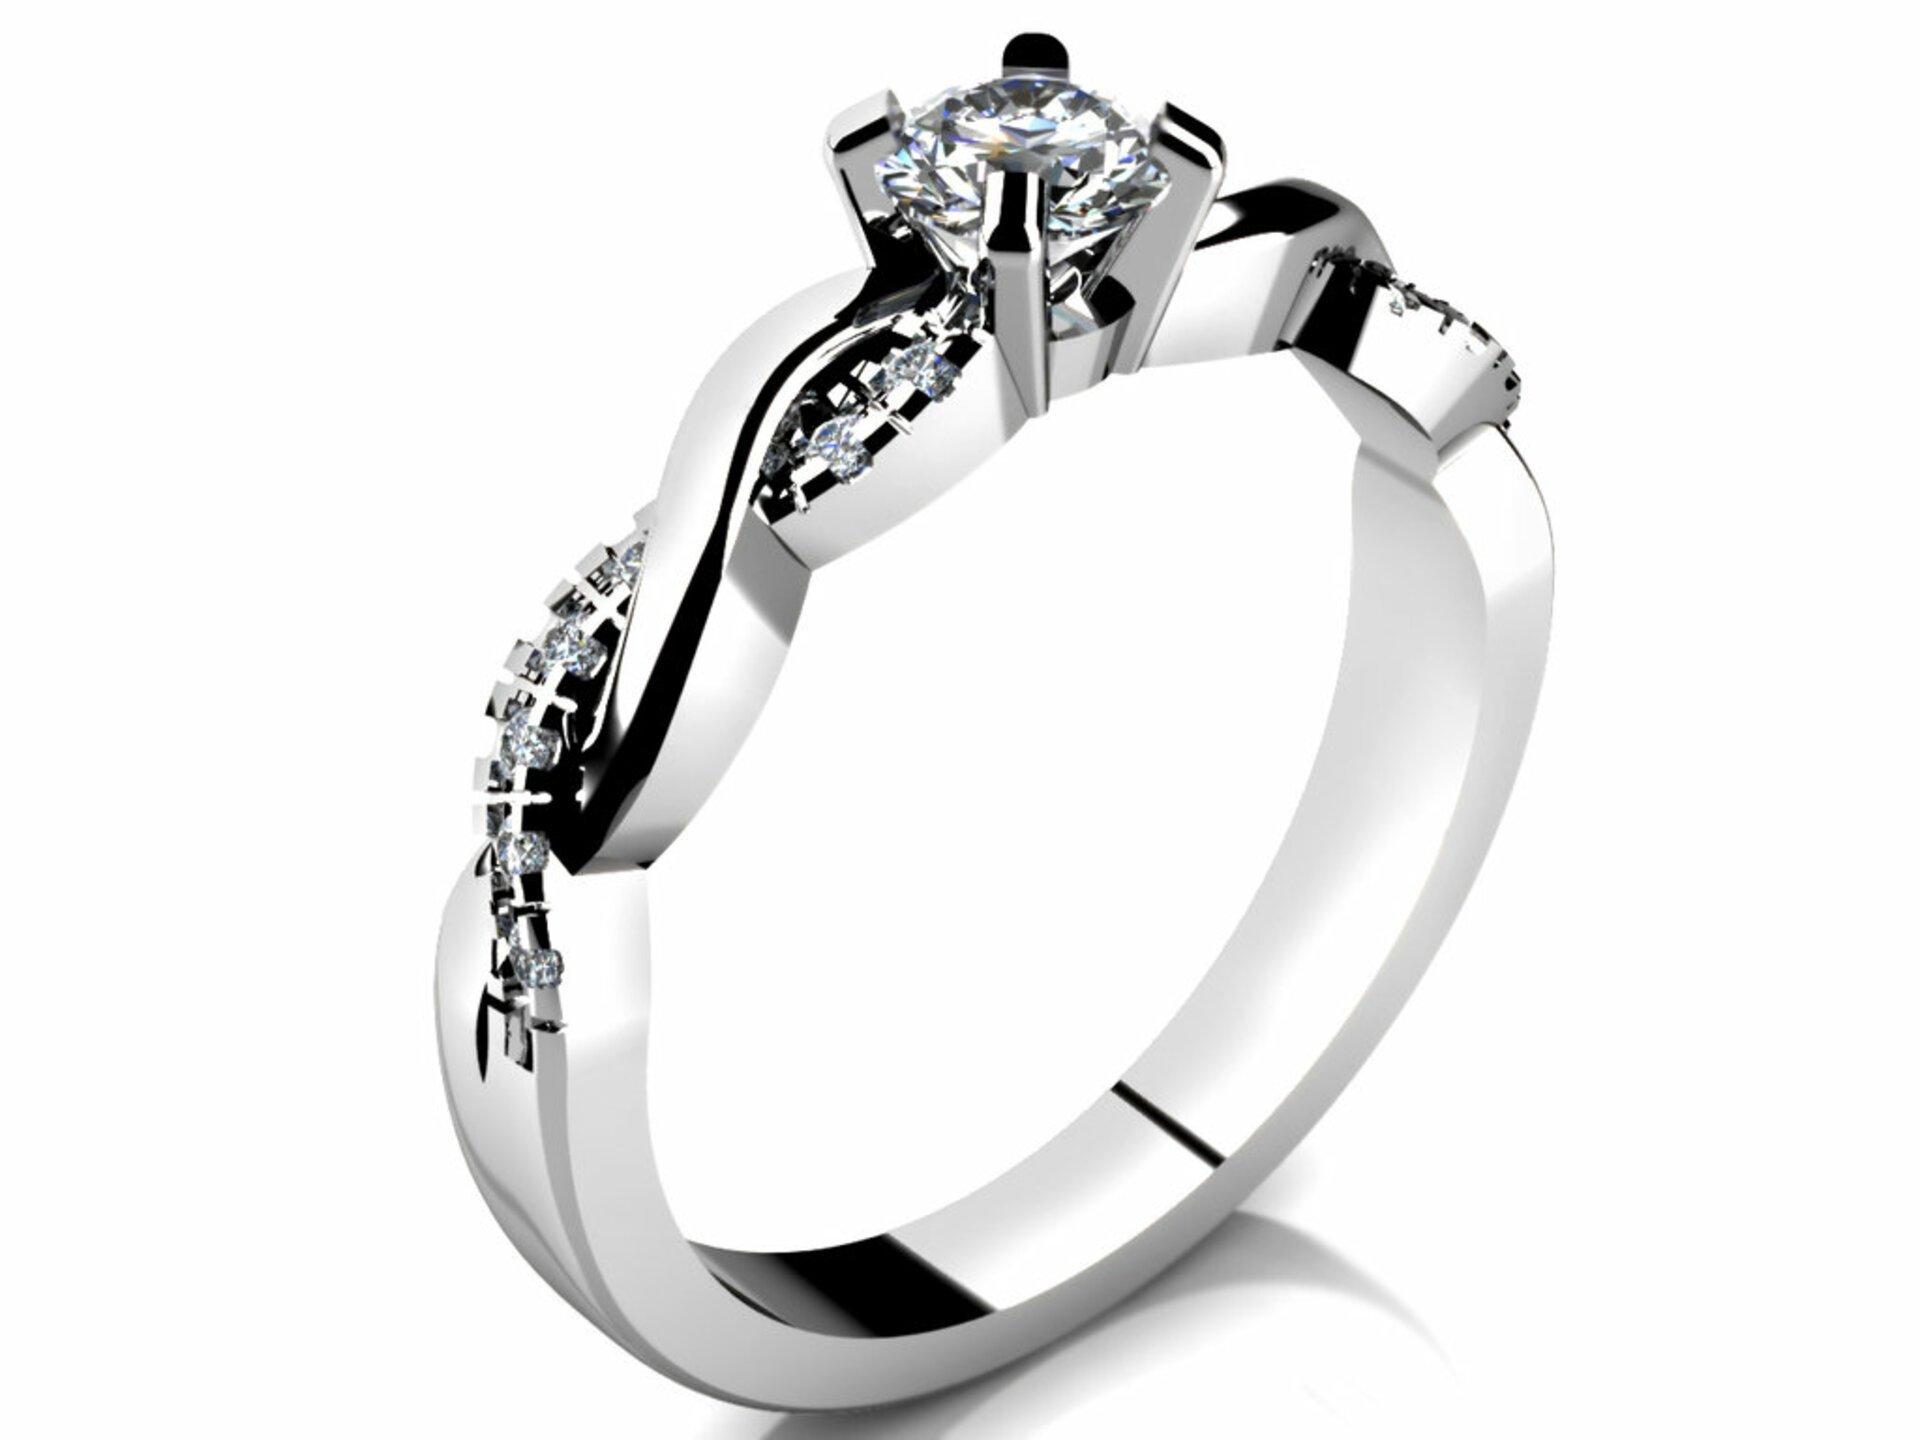 Zásnubný prsteň - model LOVE 084 - biele zlato  a83e0826751